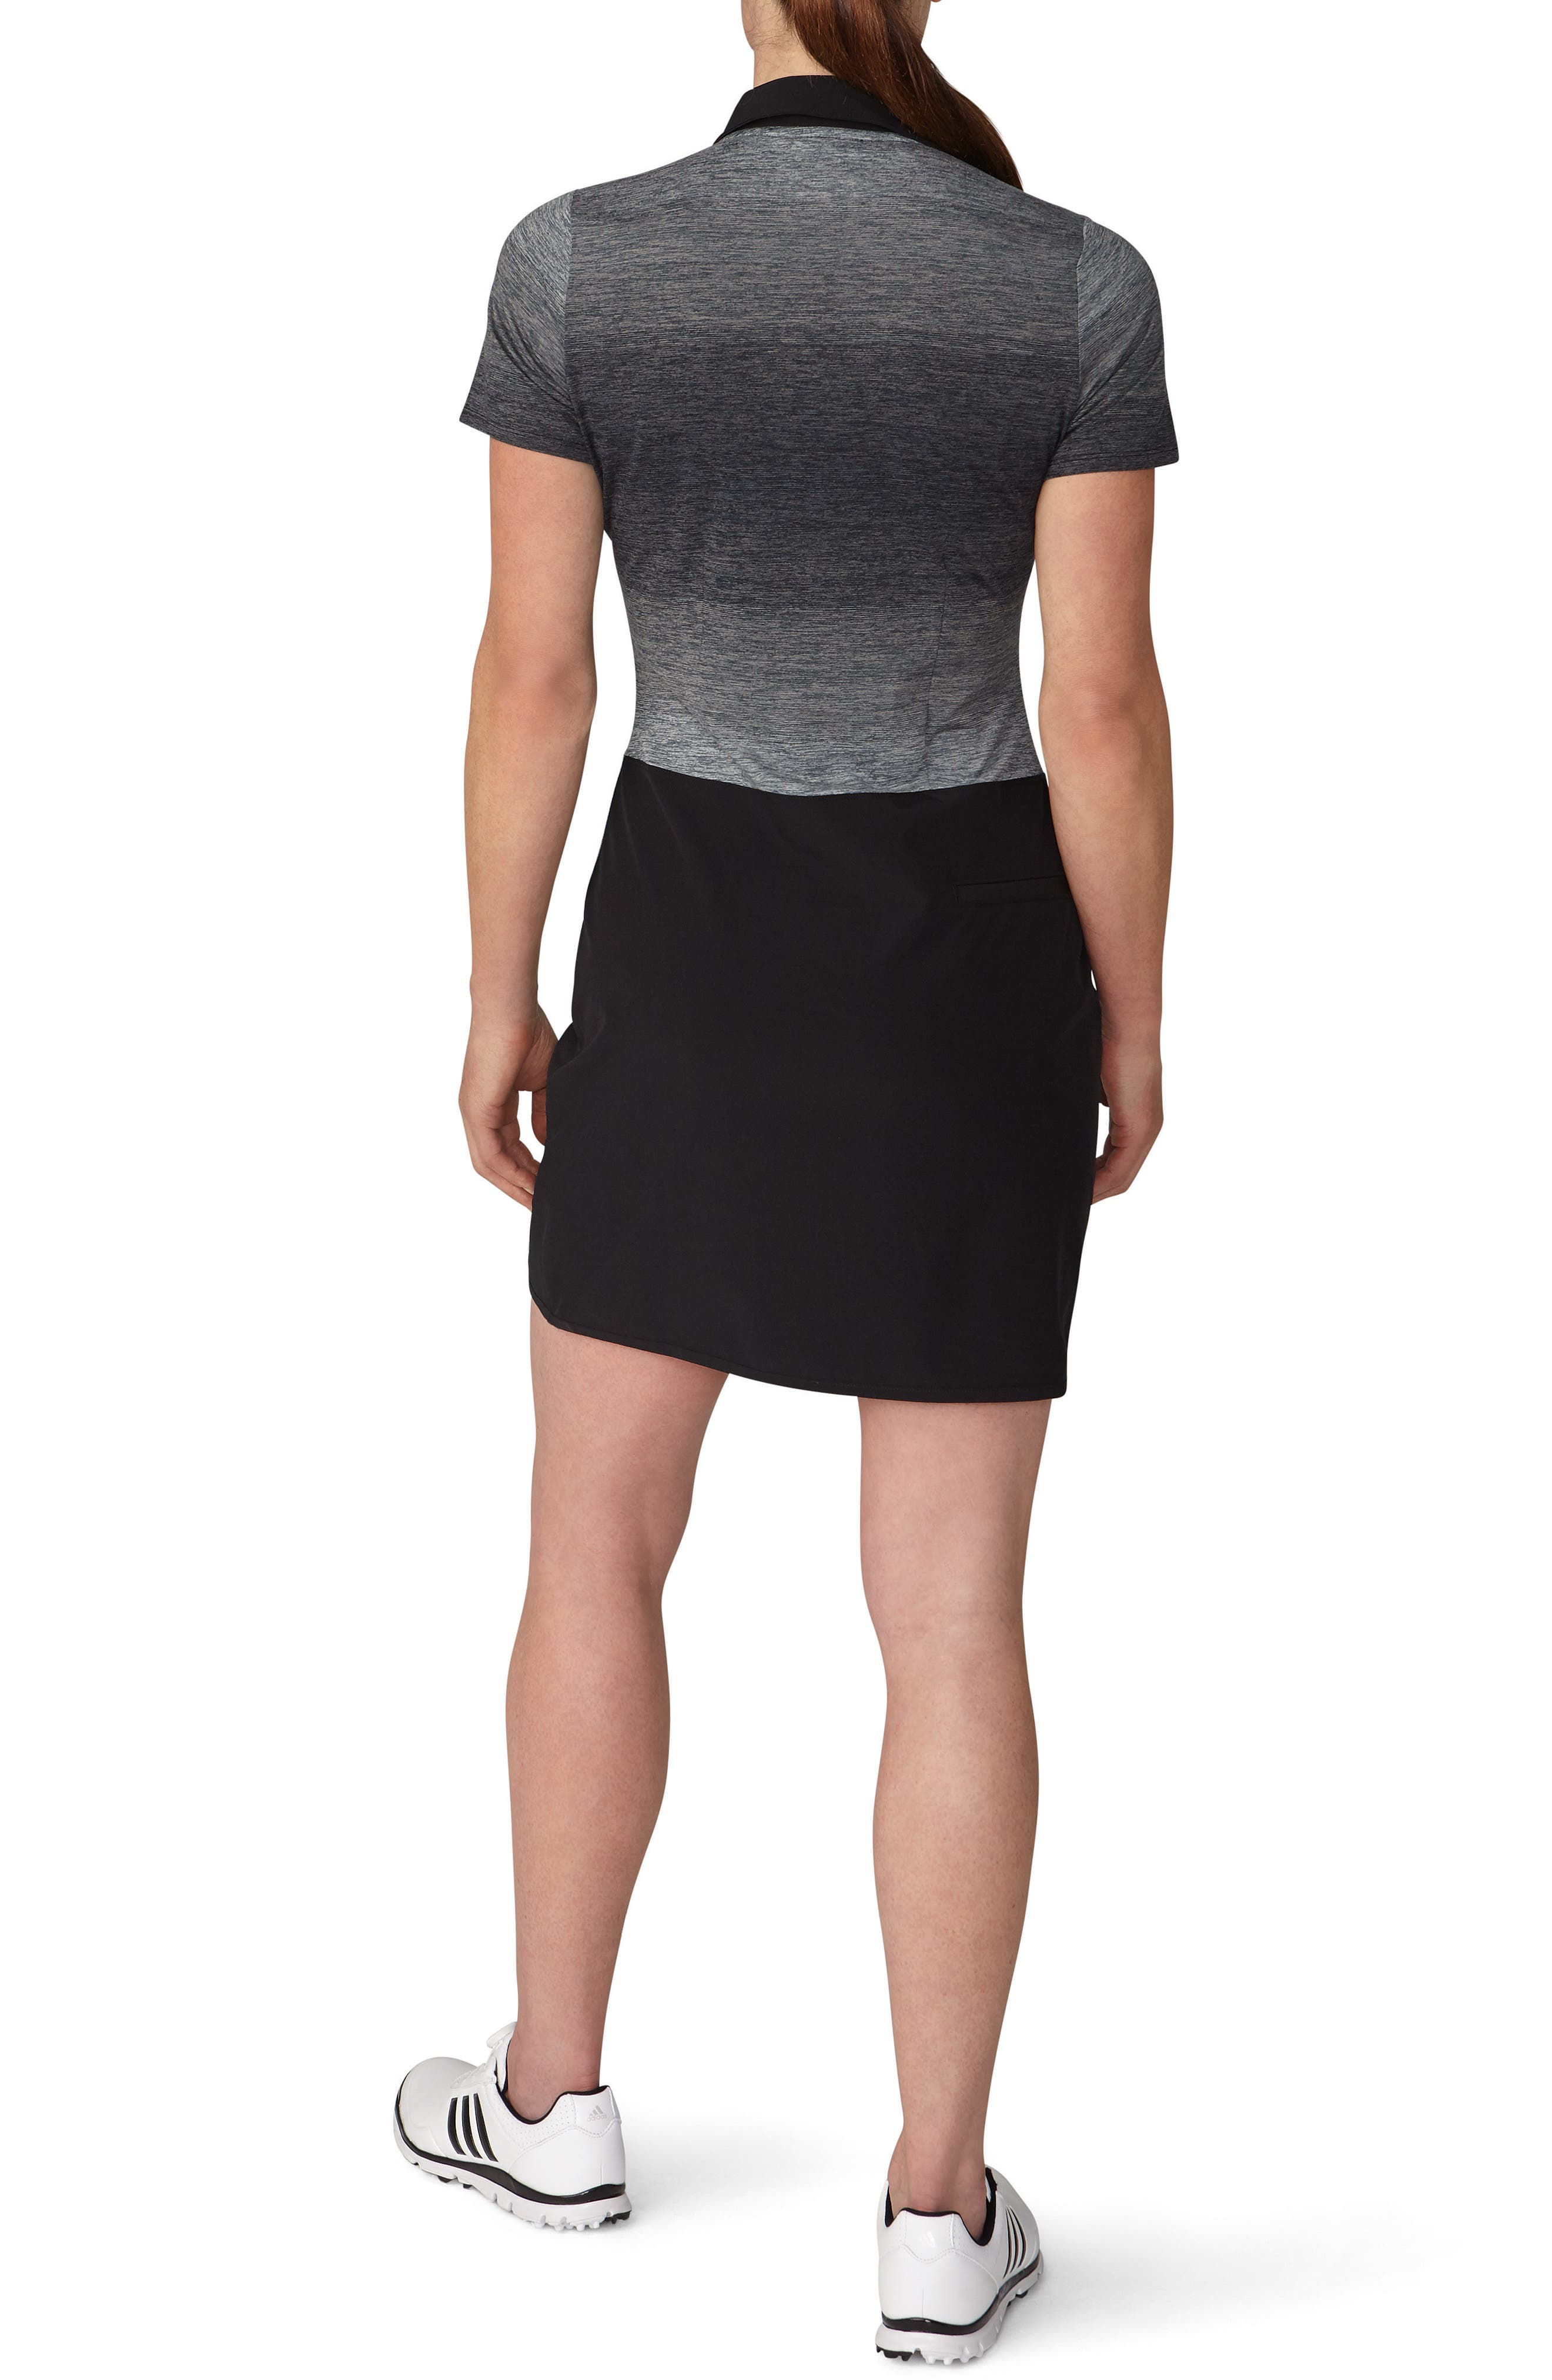 Rangewear Golf Dress,                             Alternate thumbnail 2, color,                             Black